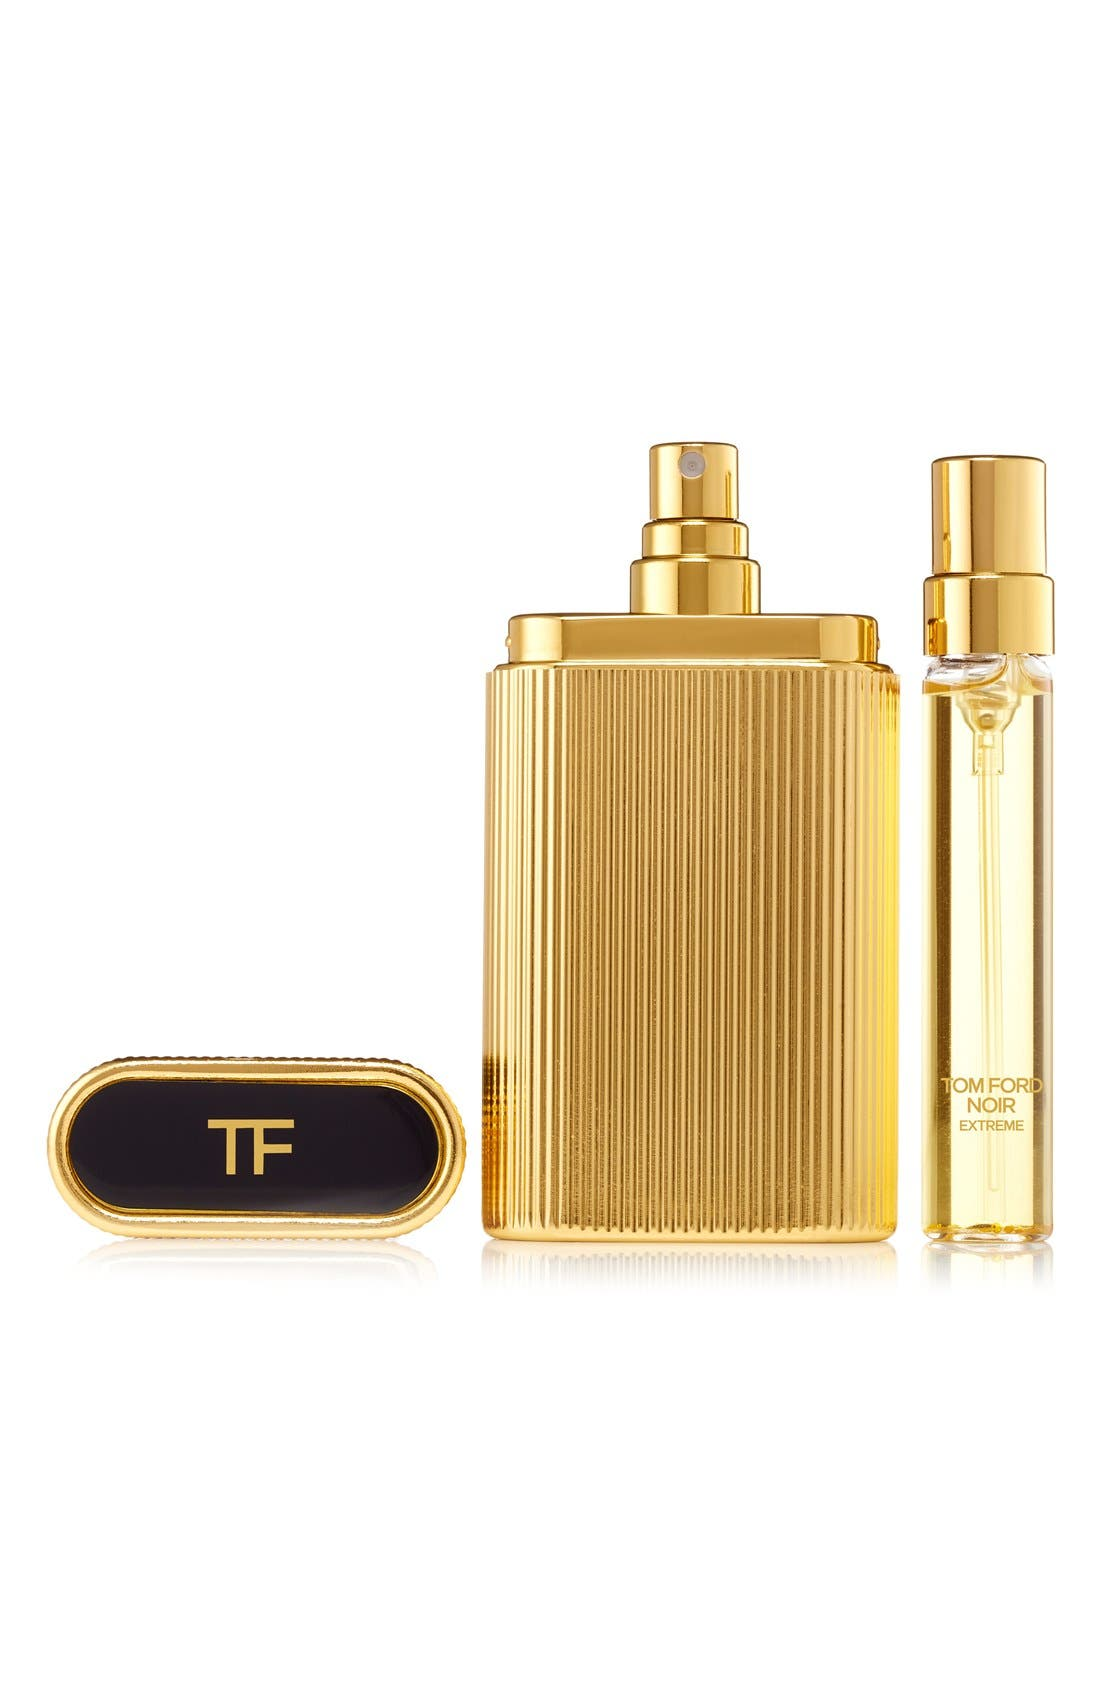 Noir Extreme Perfume Atomizer,                             Main thumbnail 1, color,                             NO COLOR